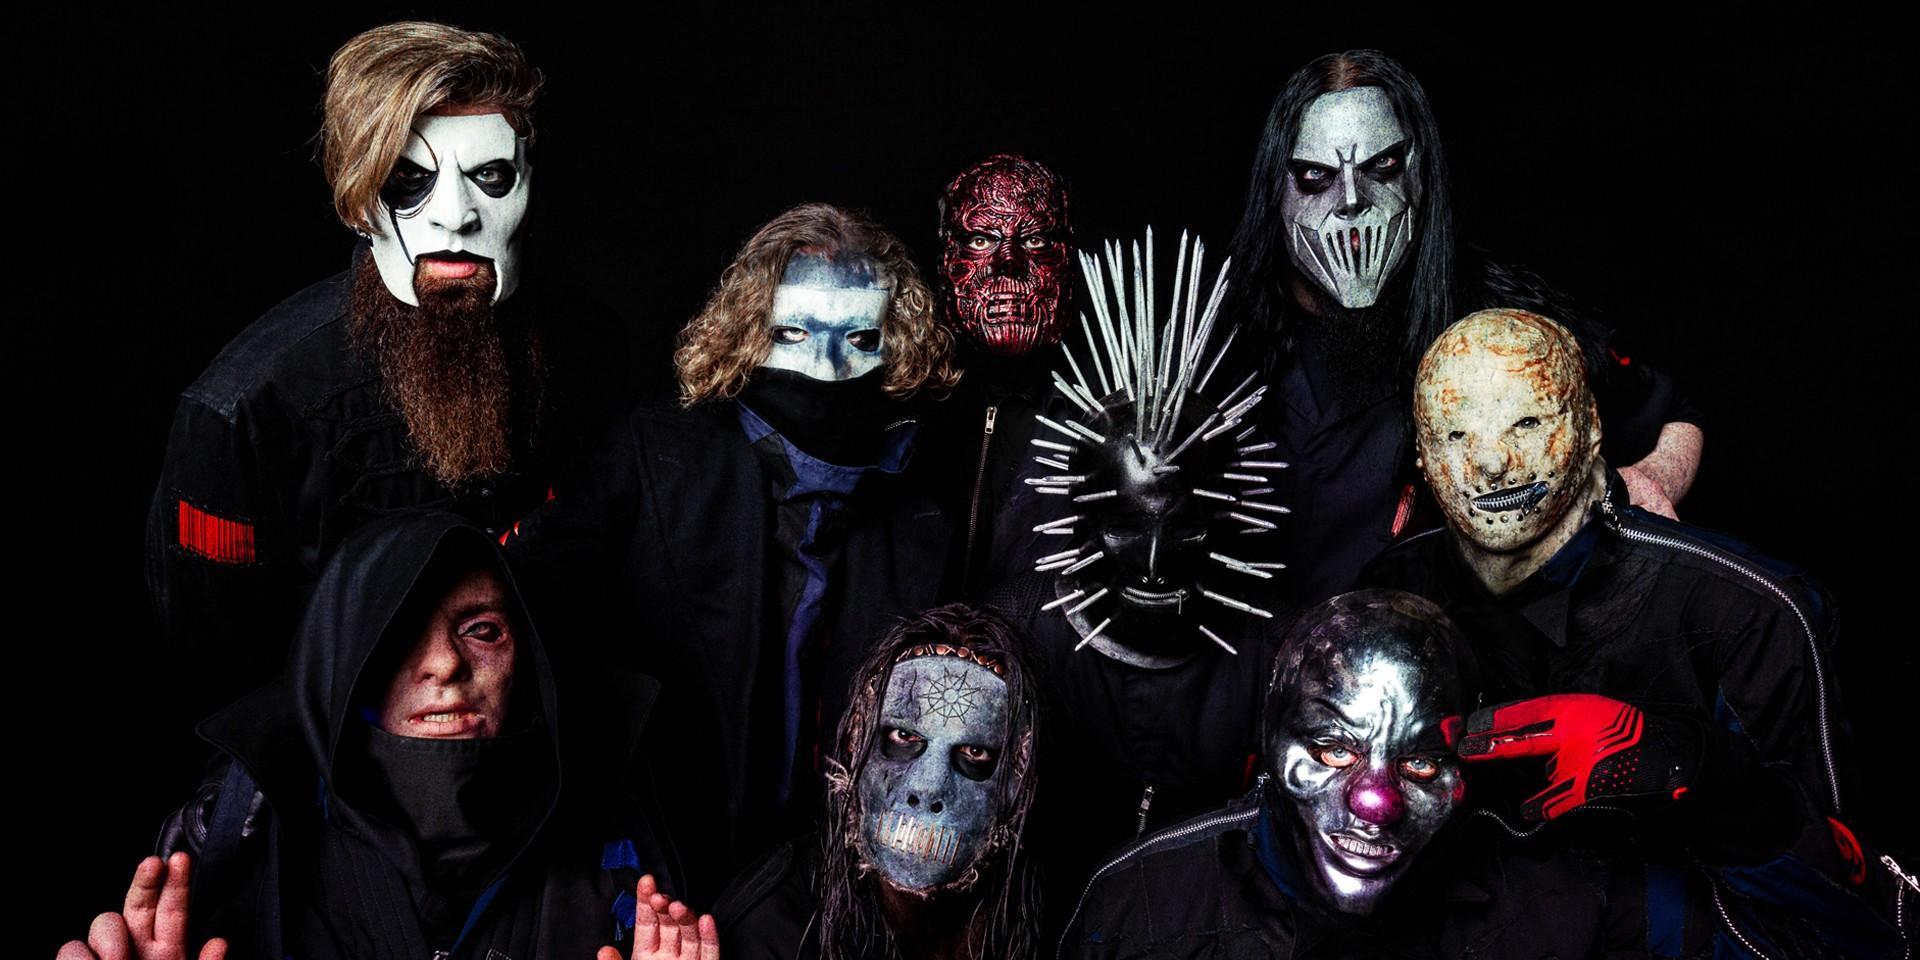 Ticketing details for Slipknot's Singapore 2020 concert revealed